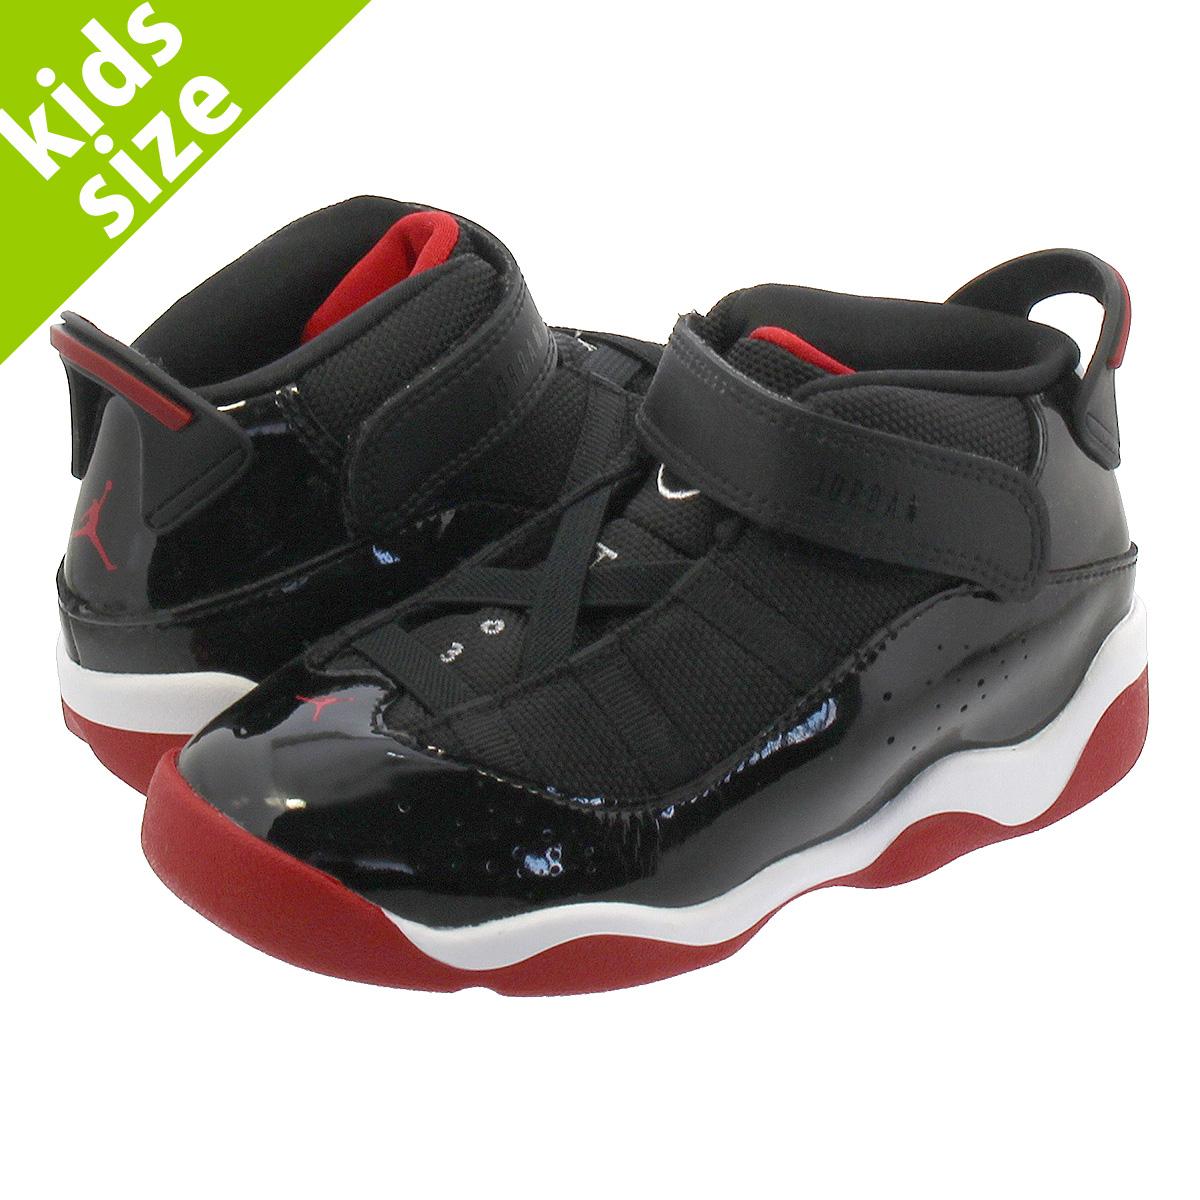 107cb840e4769a SELECT SHOP LOWTEX  NIKE JORDAN 6 RINGS TD Nike Jordan 6 RINGS Co ...